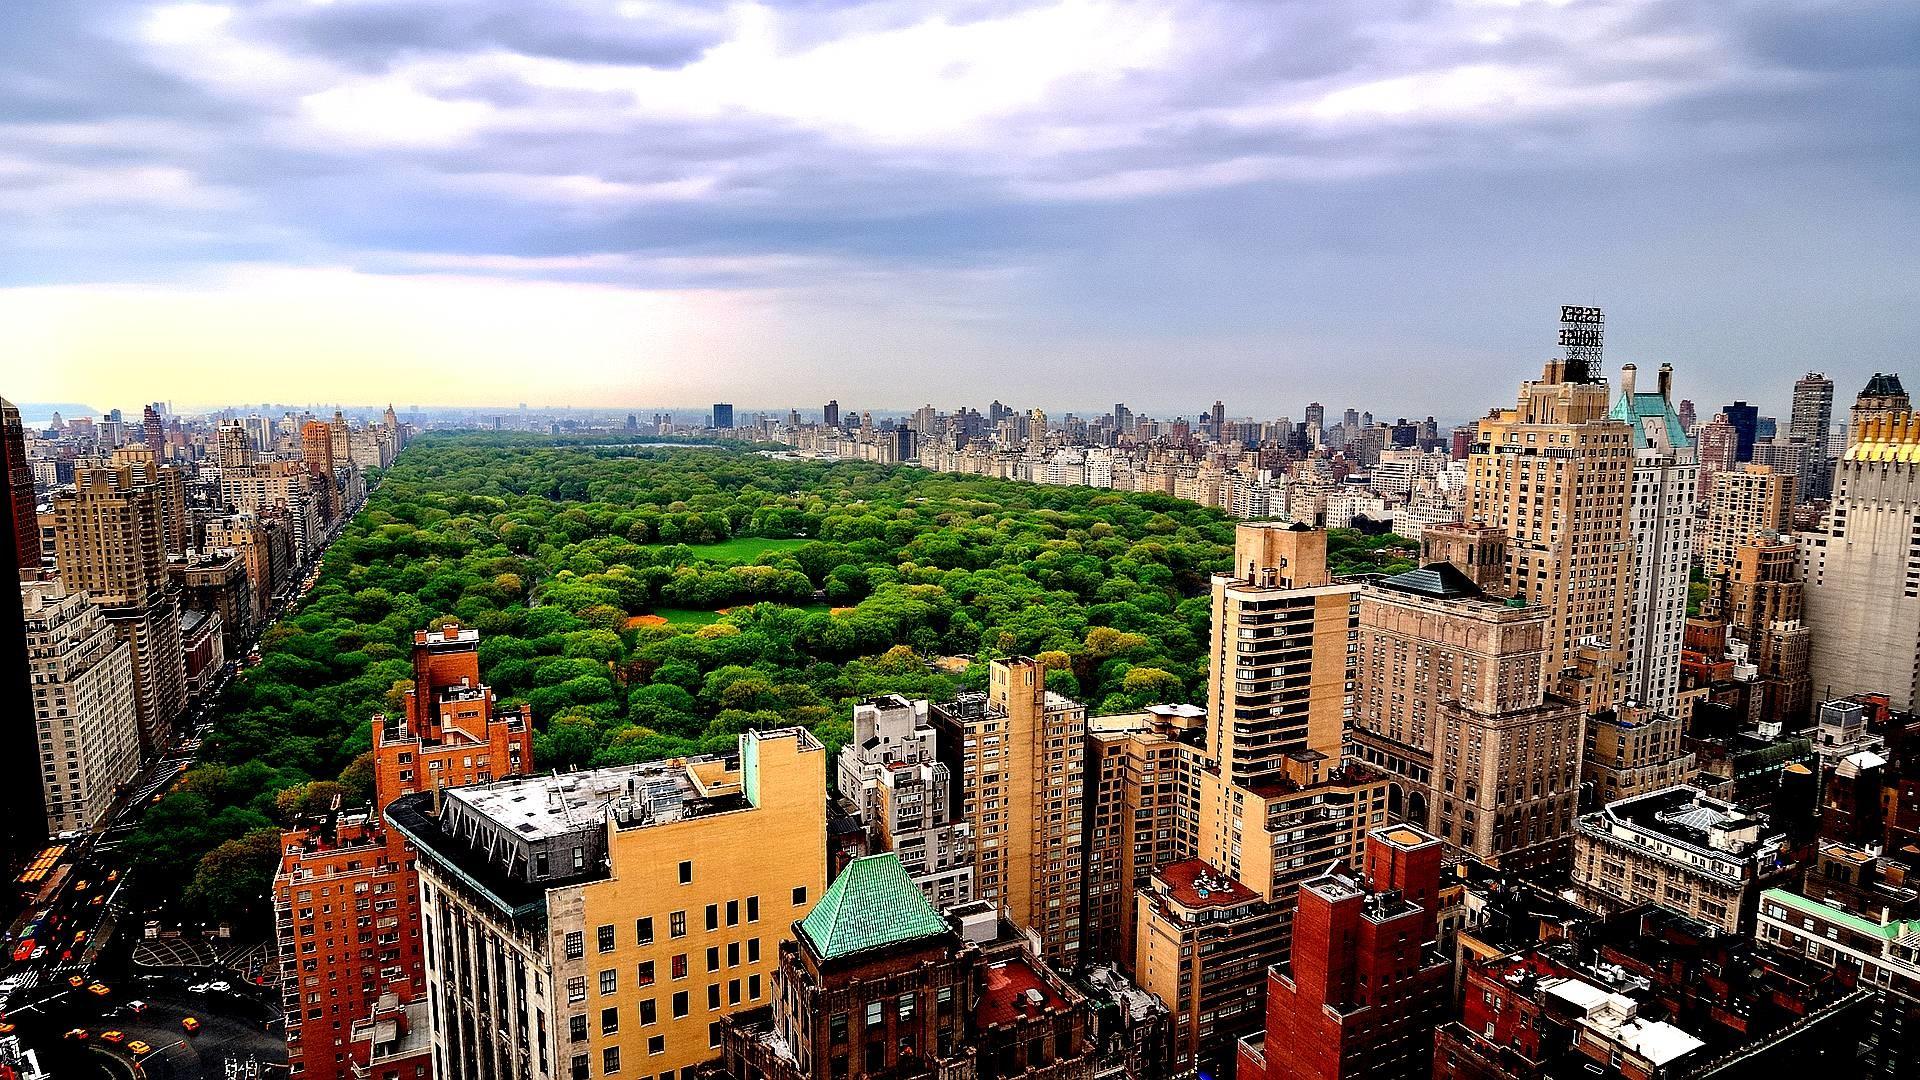 New York City Desktop Backgrounds 67 Pictures